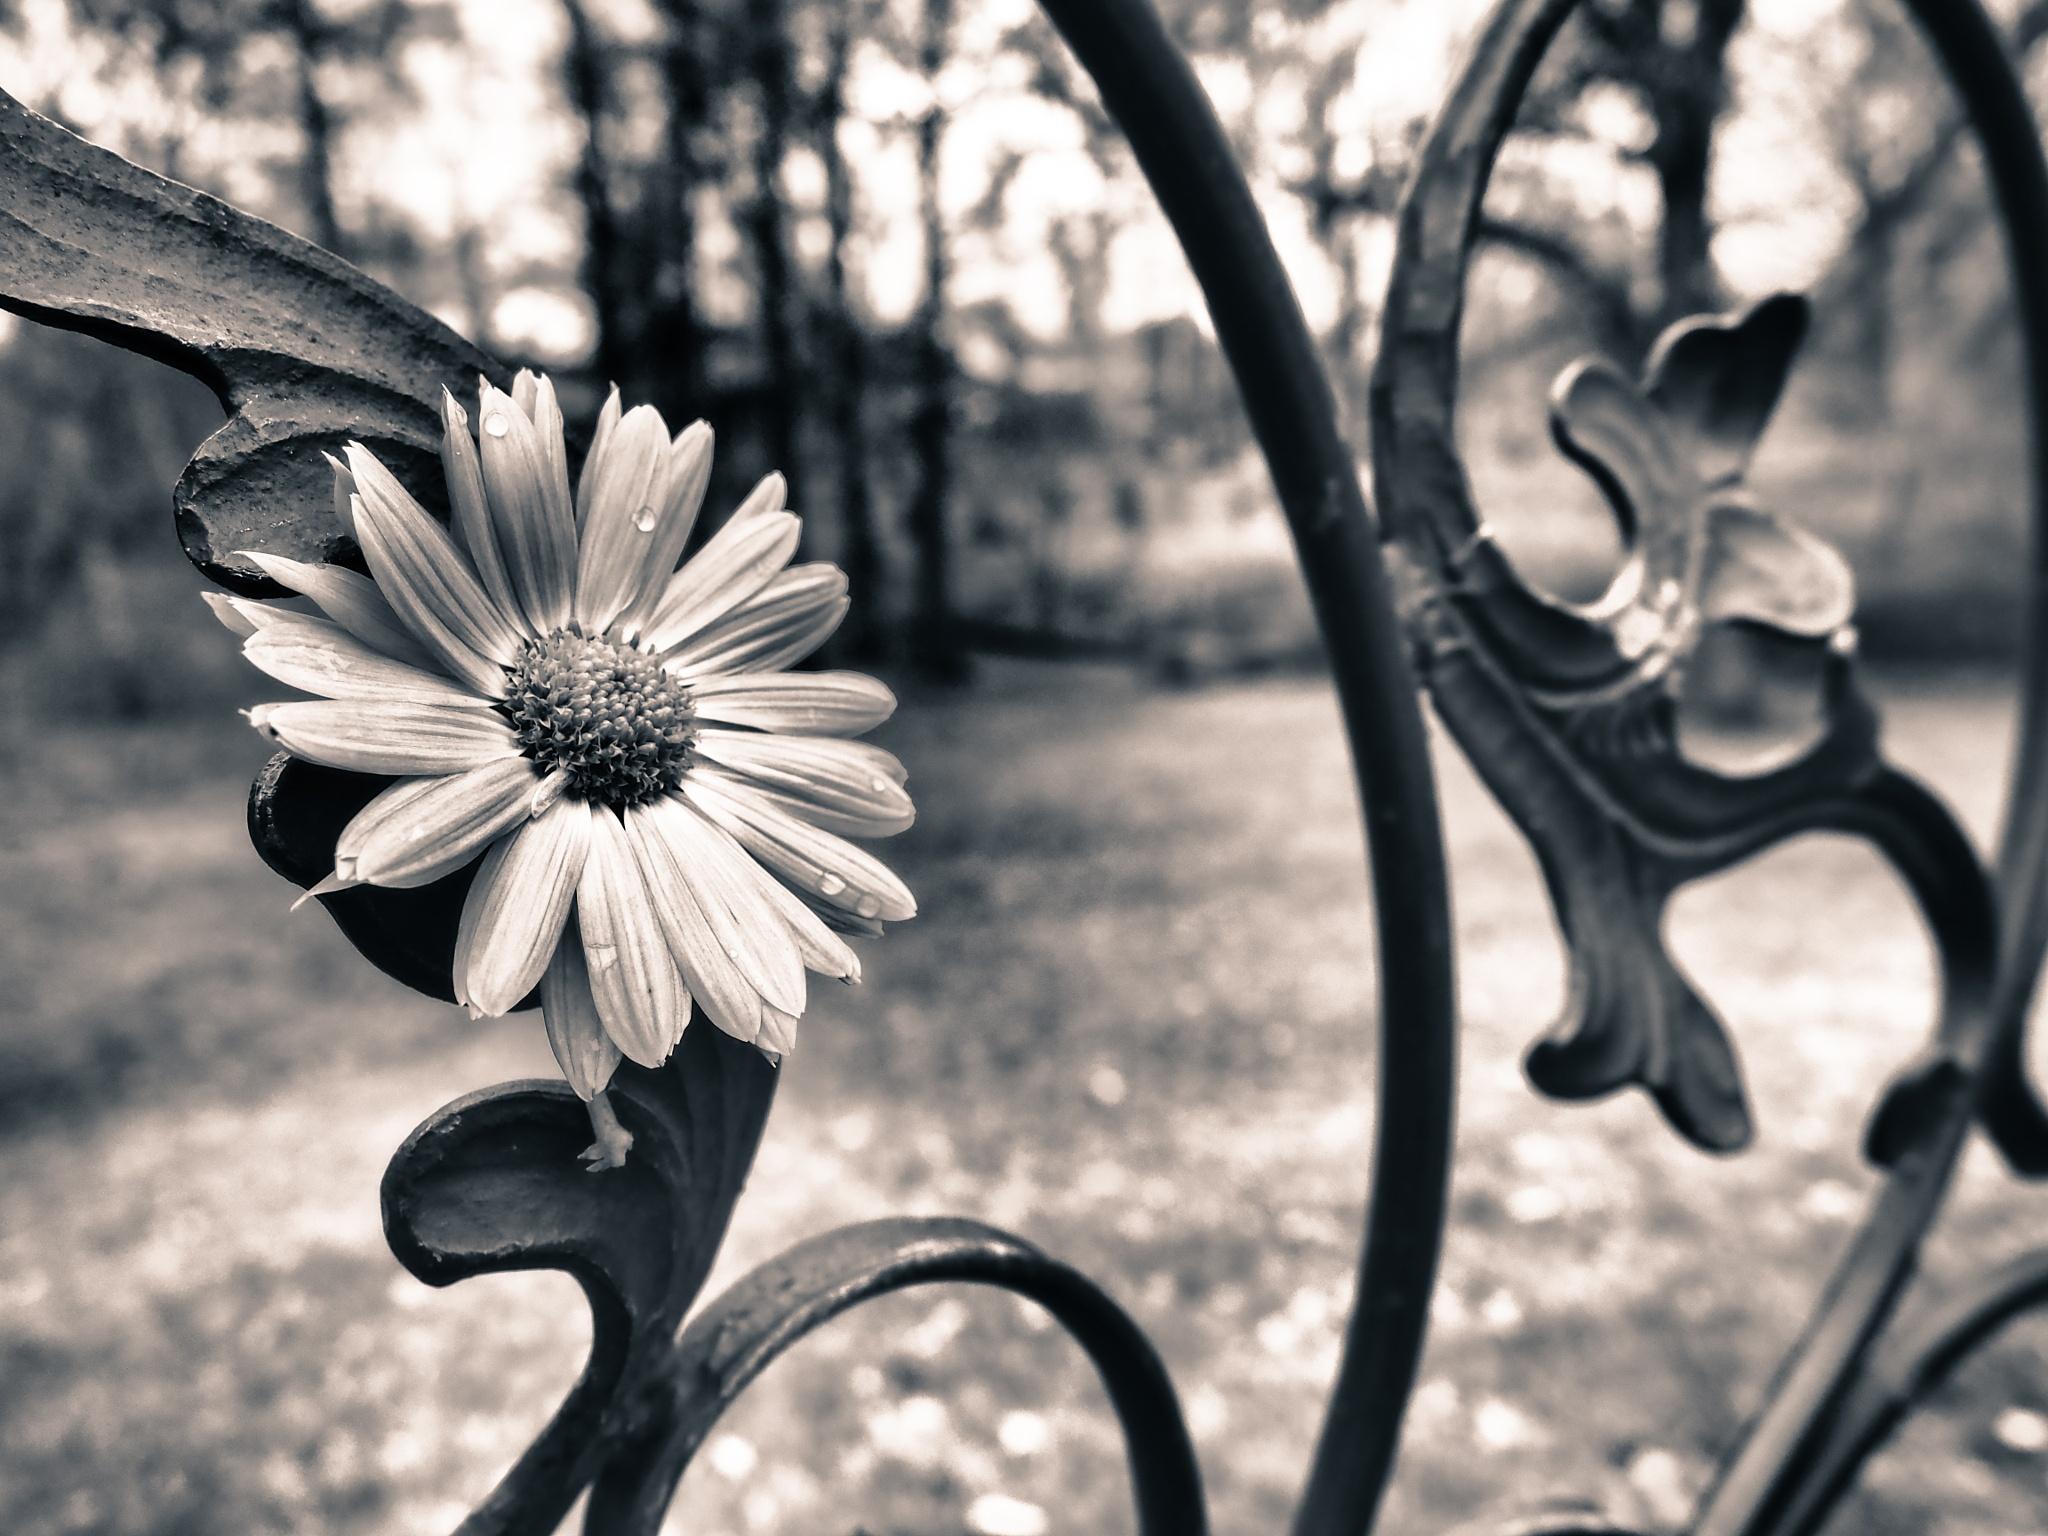 Berlin Flower Black & White by Jeans Brown Photography / Jens Schwarz